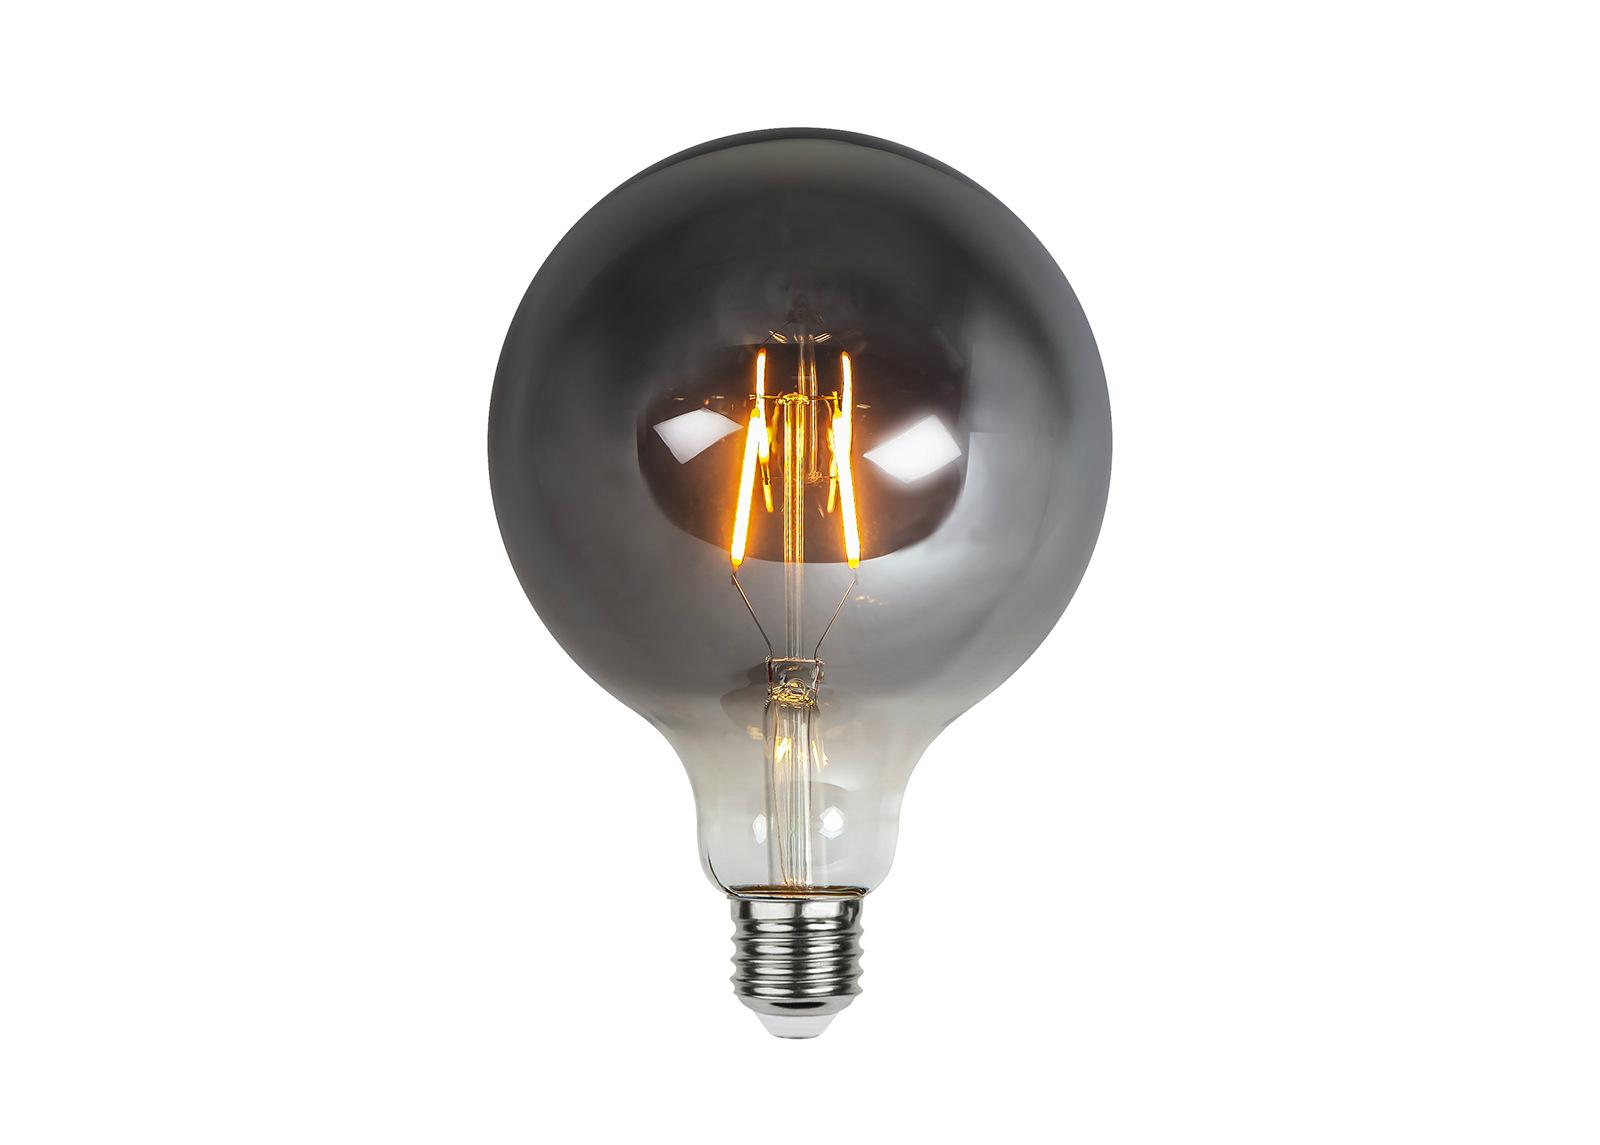 LED sähkölamppu E27 1,8 W